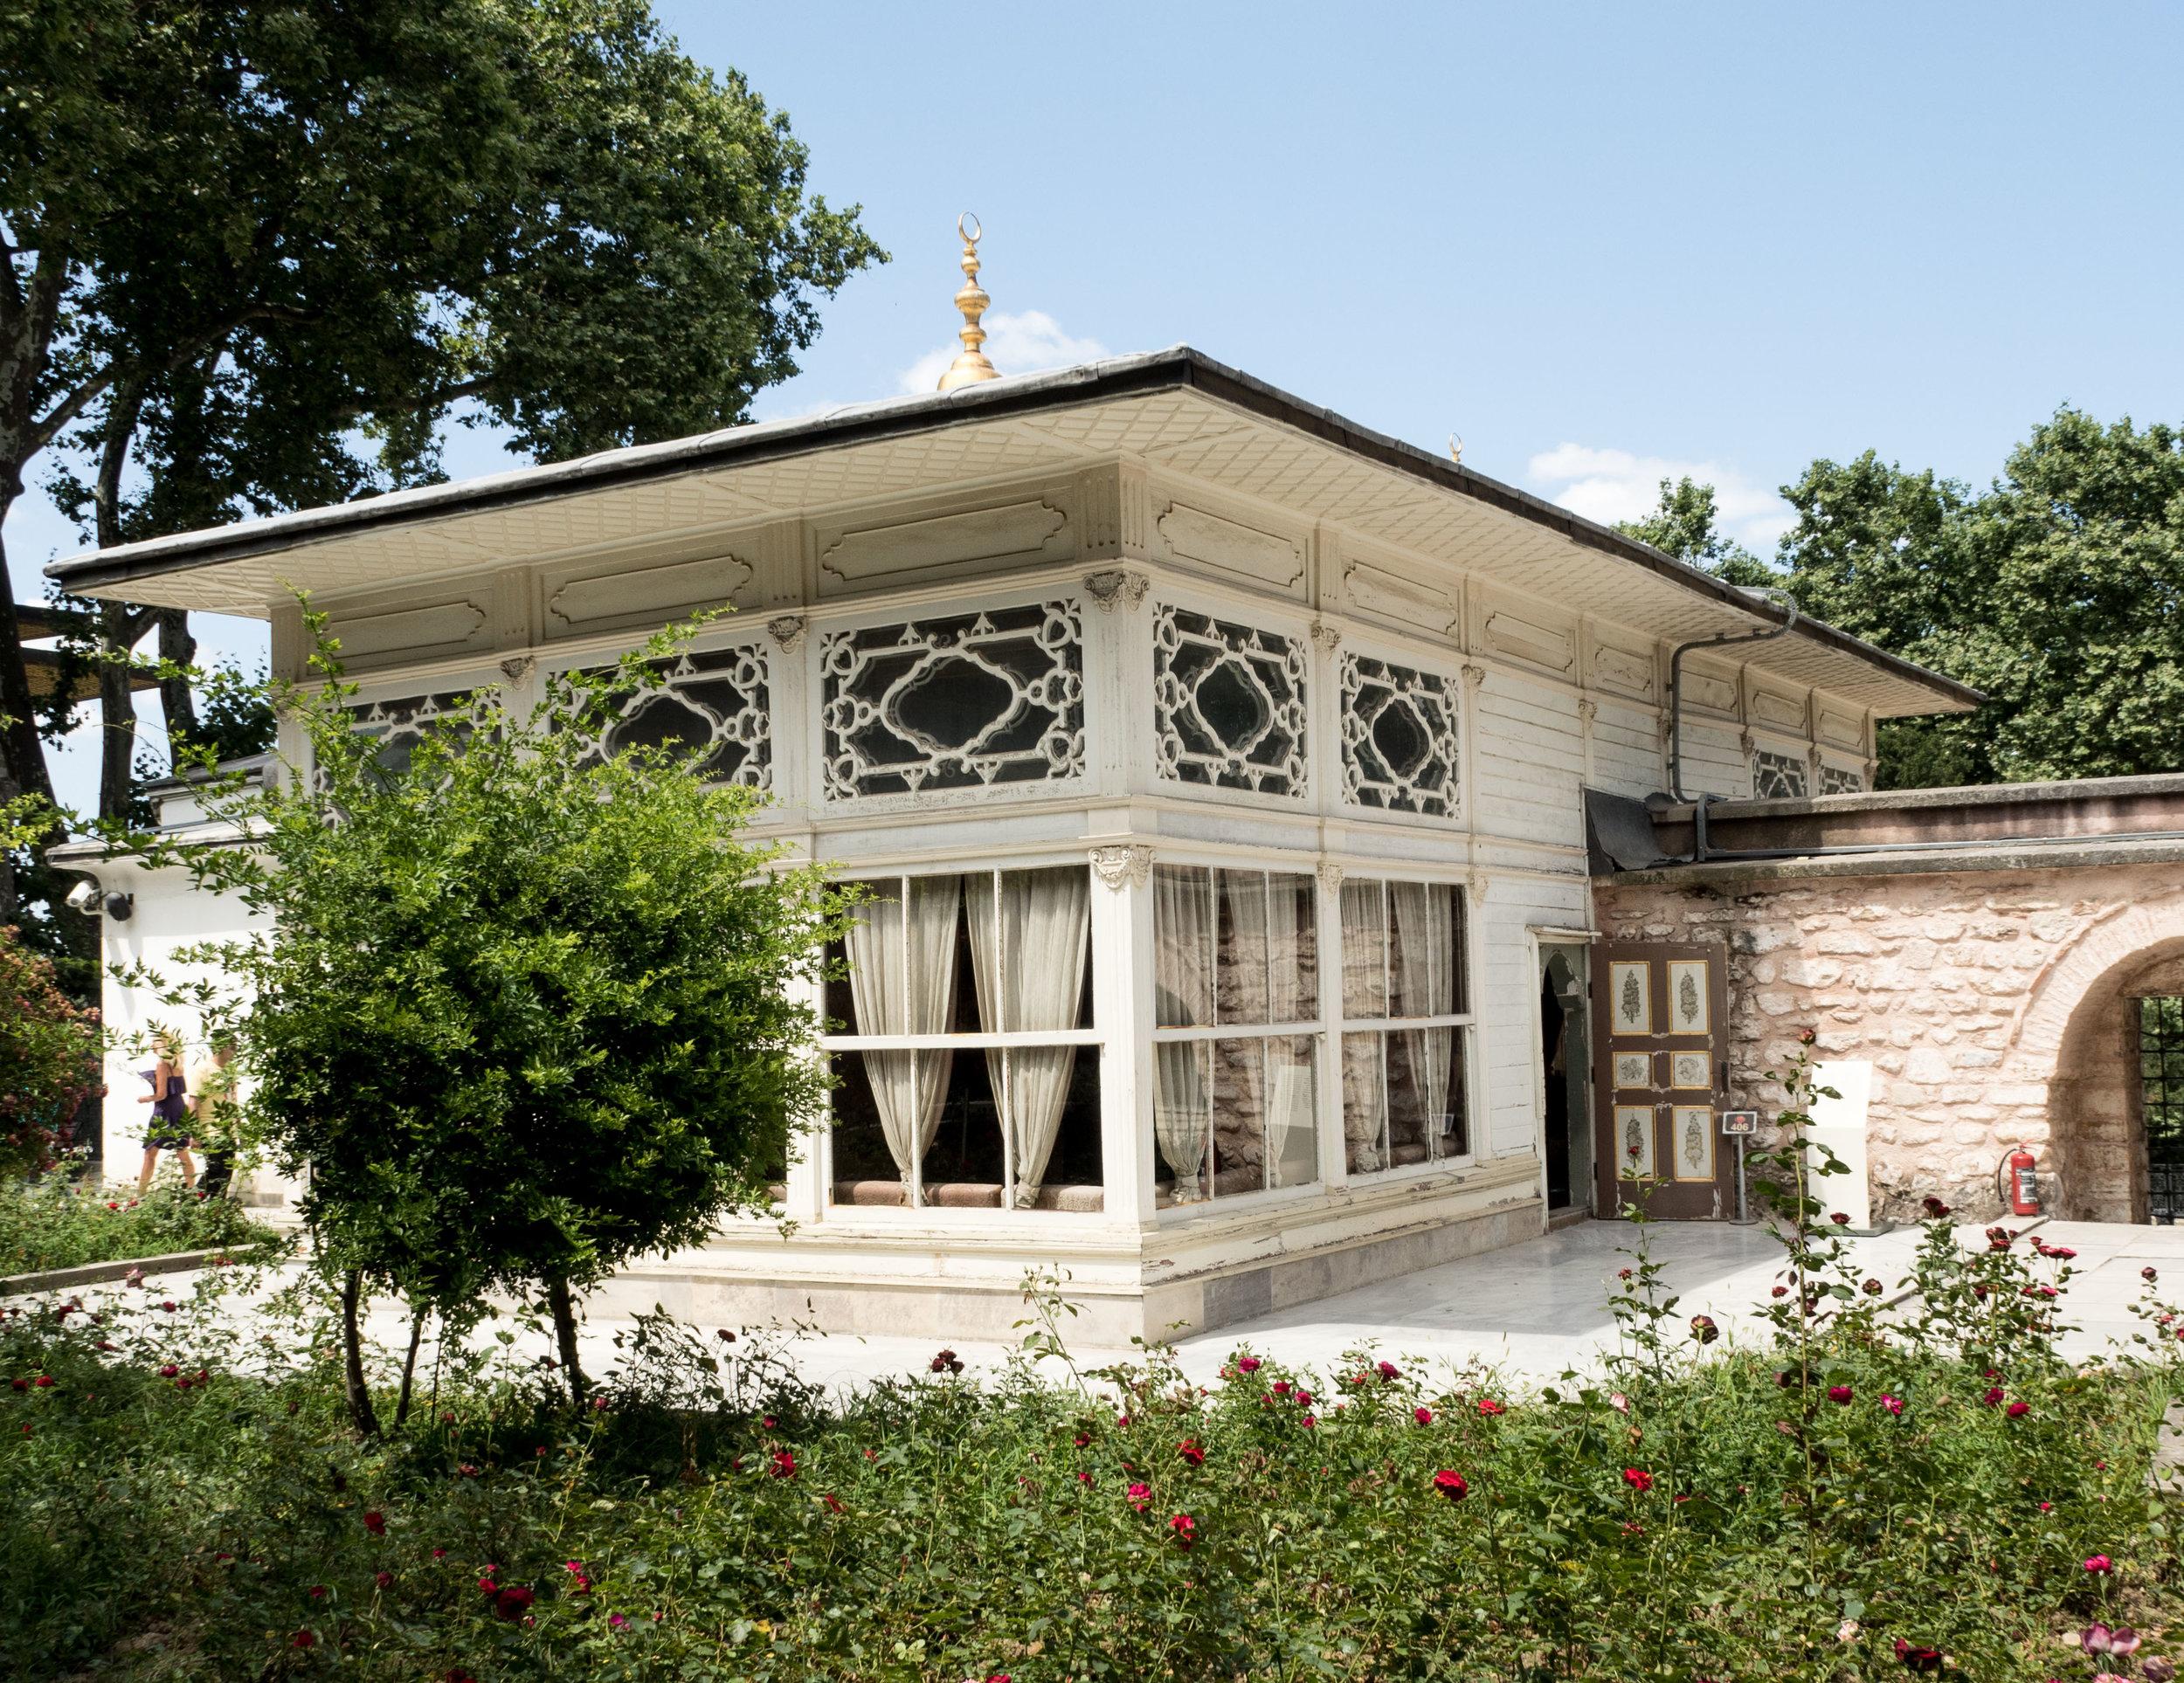 Mustafa Pasha's Kiosk